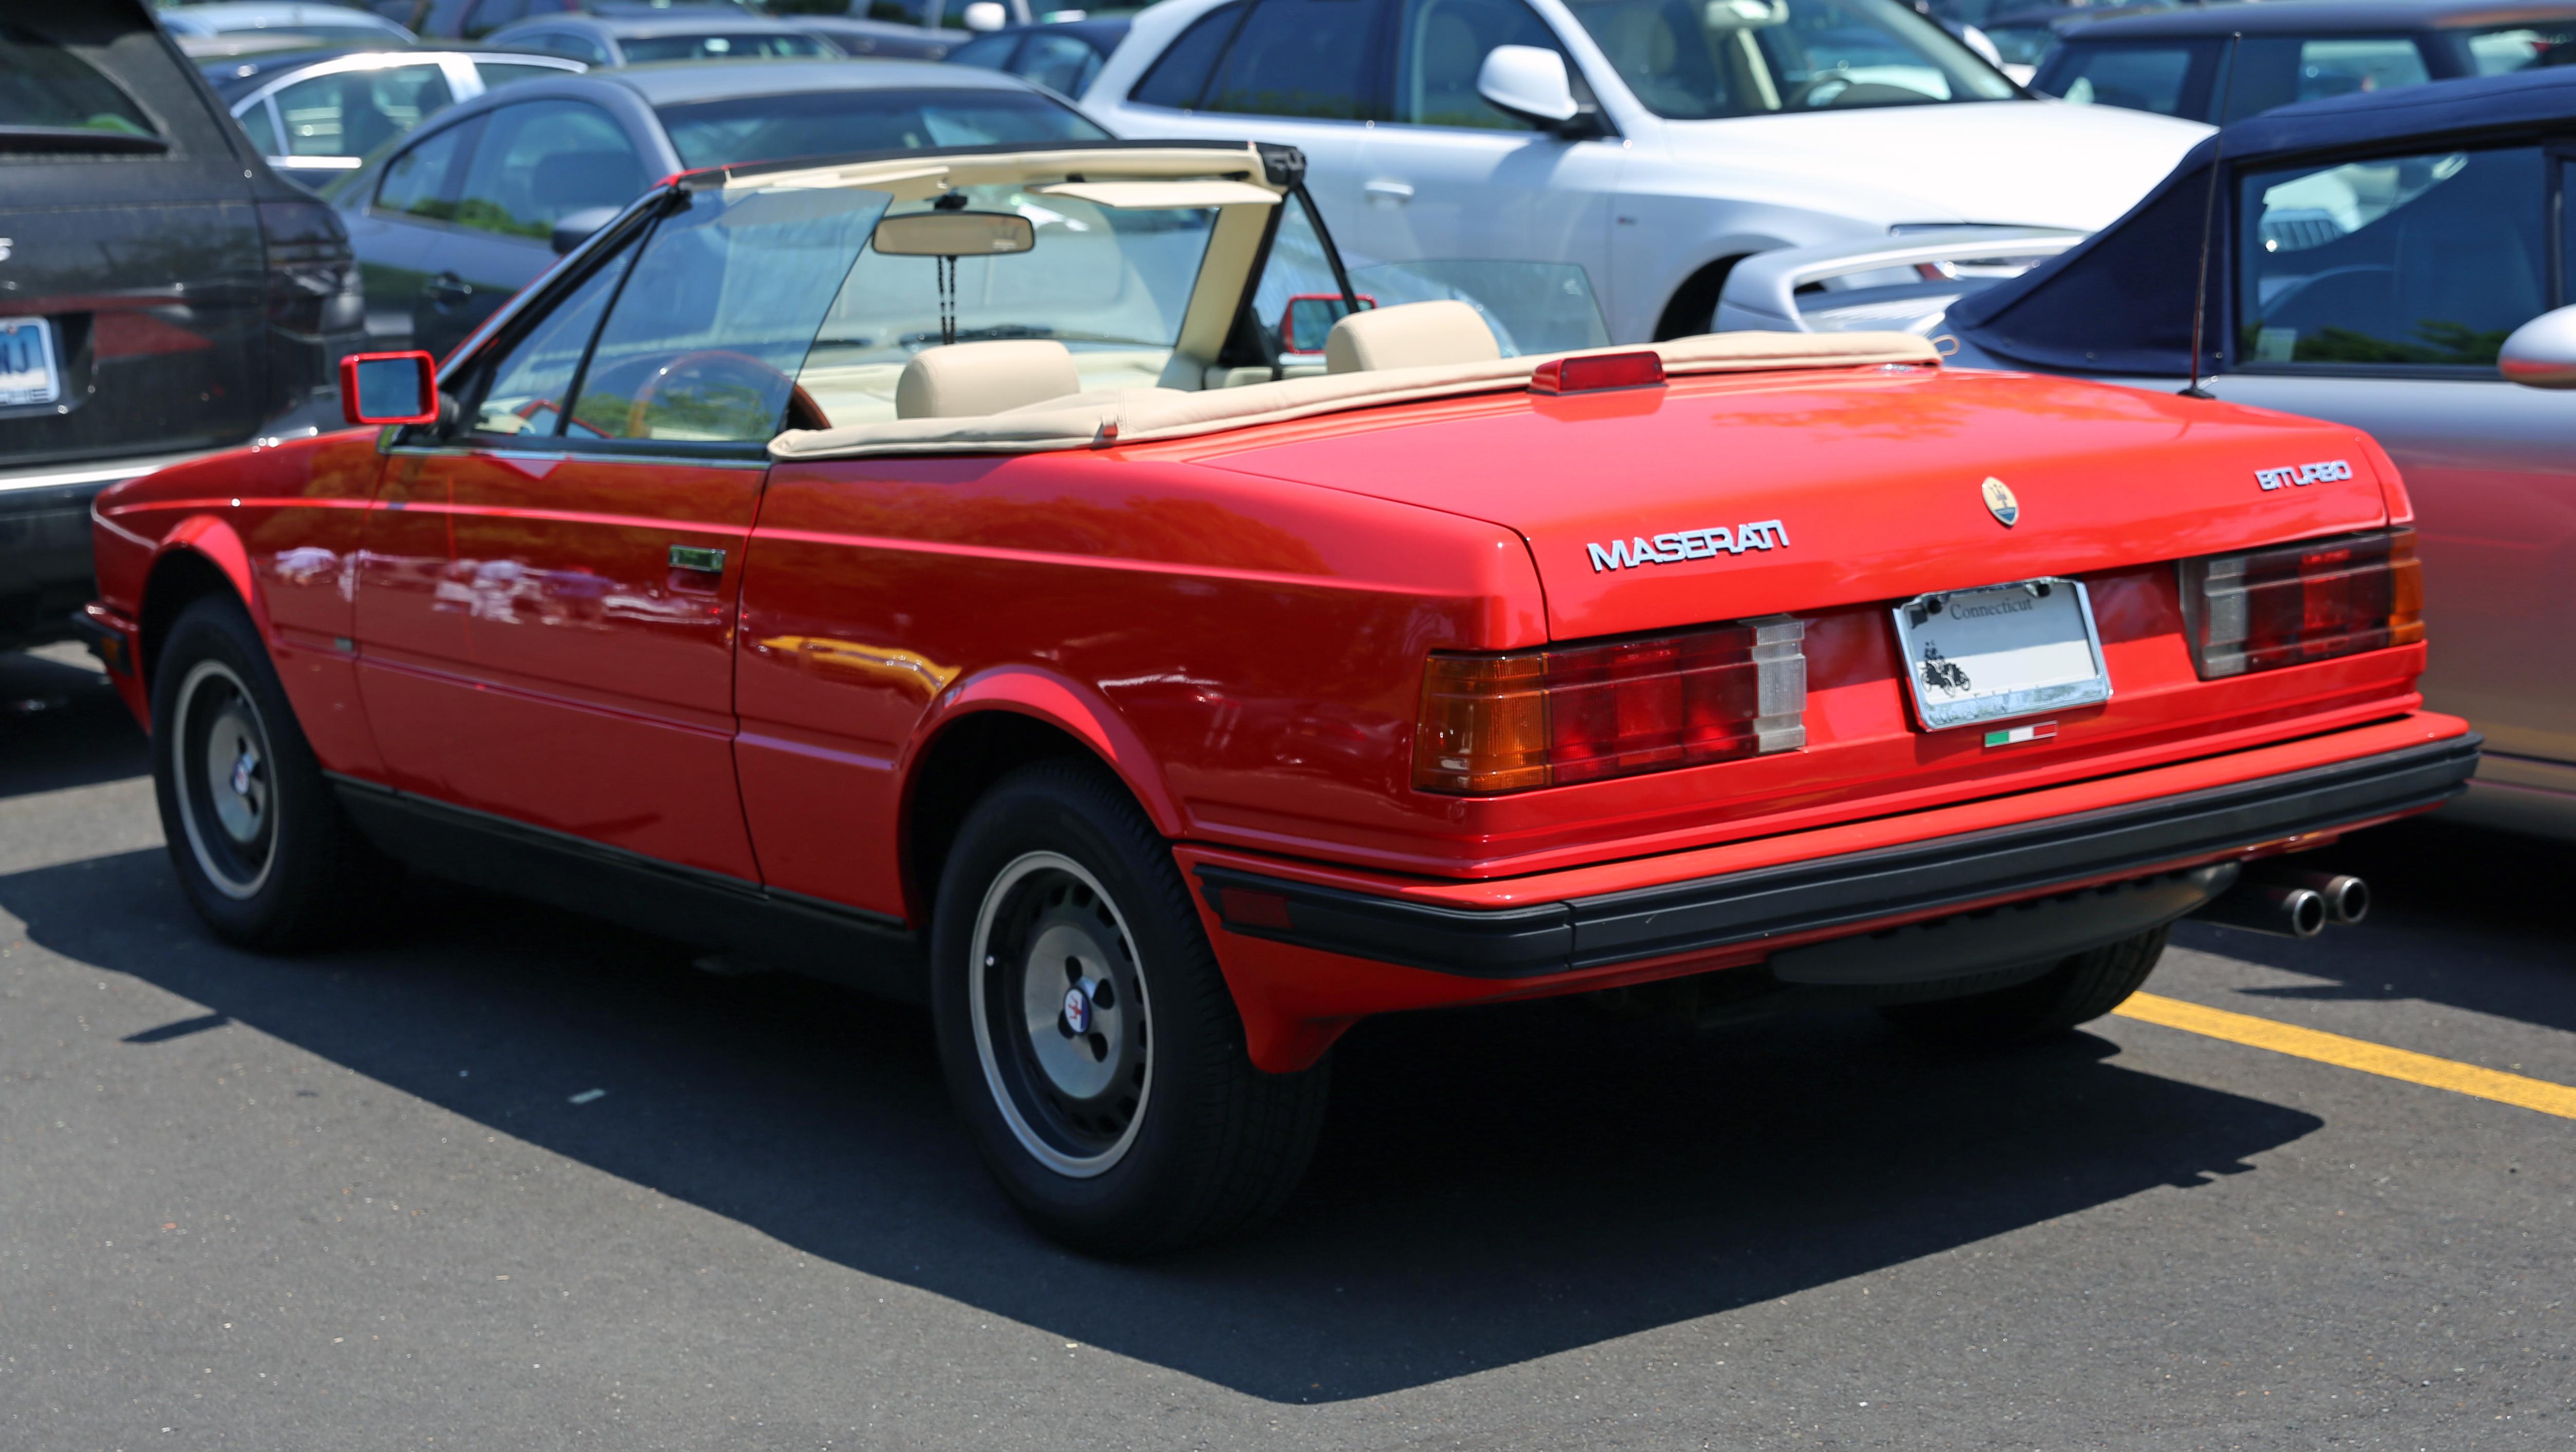 Maserati Biturbo 1981 - 1994 Cabriolet :: OUTSTANDING CARS